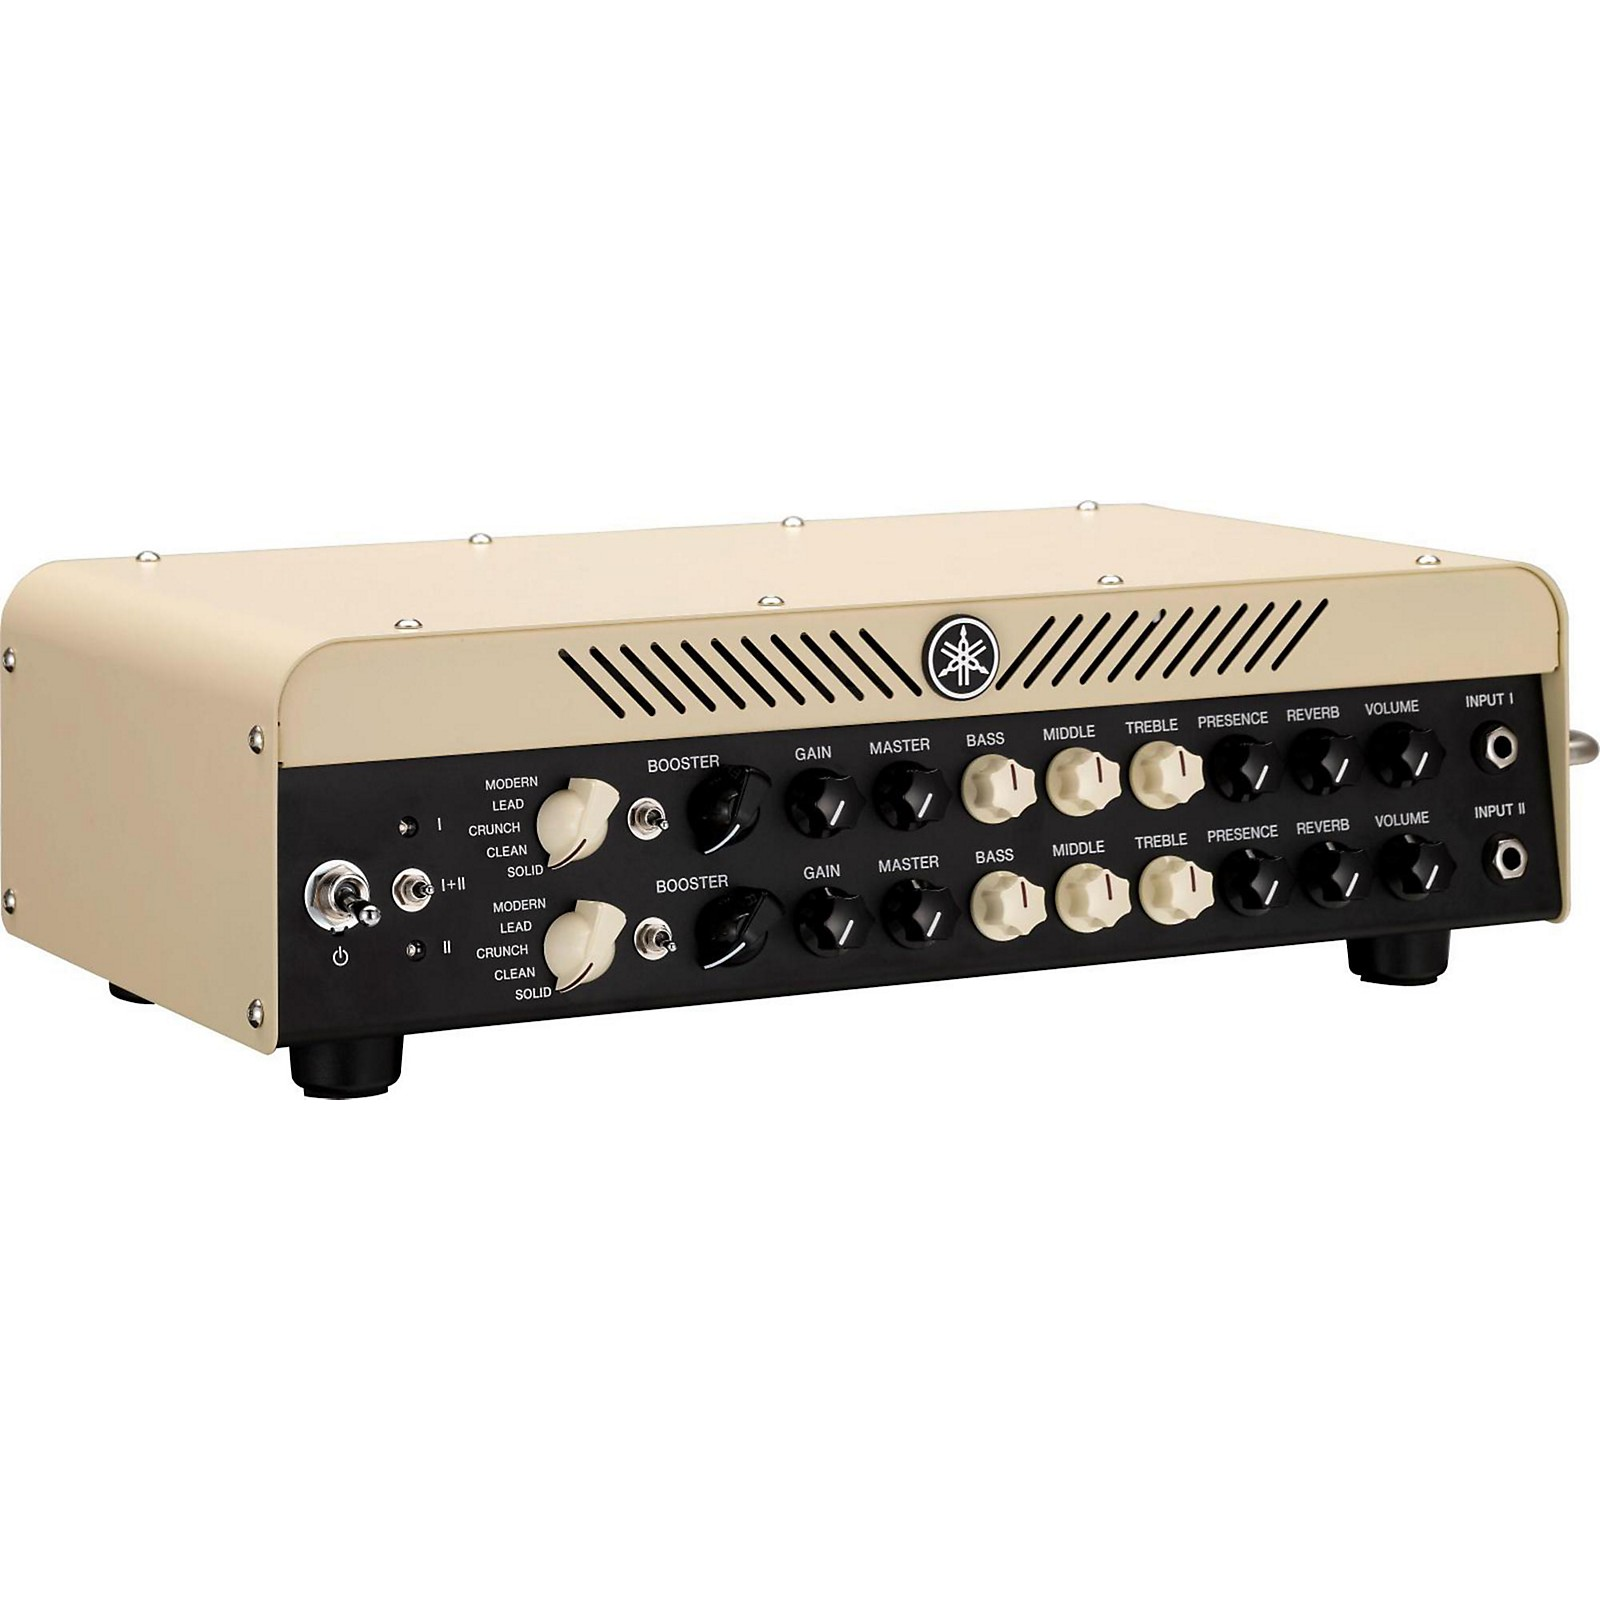 Yamaha THR100HD 100W Modeling Guitar Amp Head